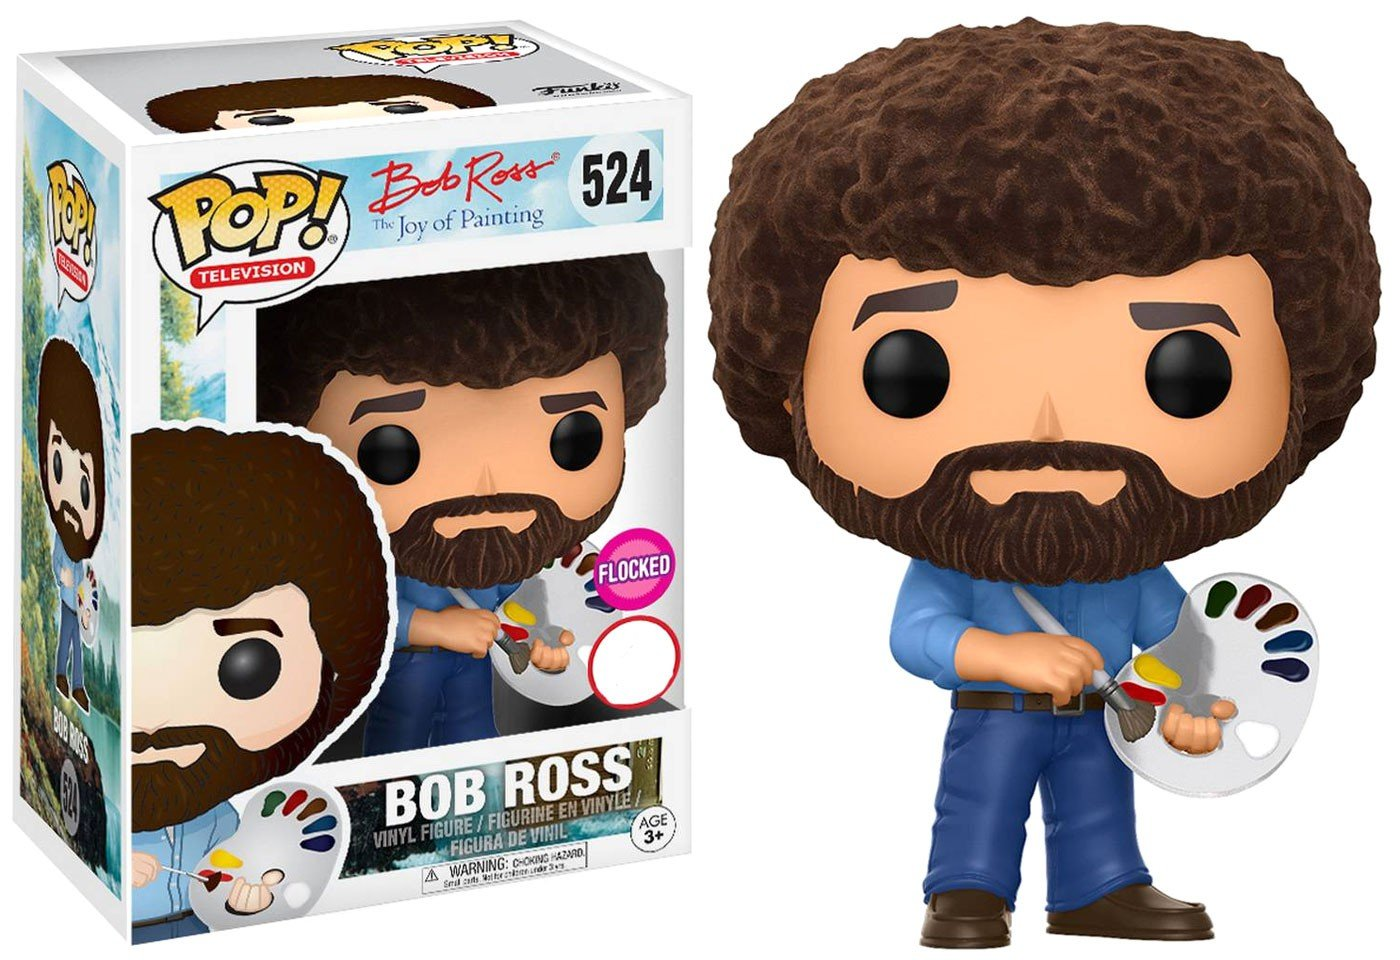 eeaad66efd2 Amazon.com  Funko POP! Flocked Bob Ross  524  Toys   Games